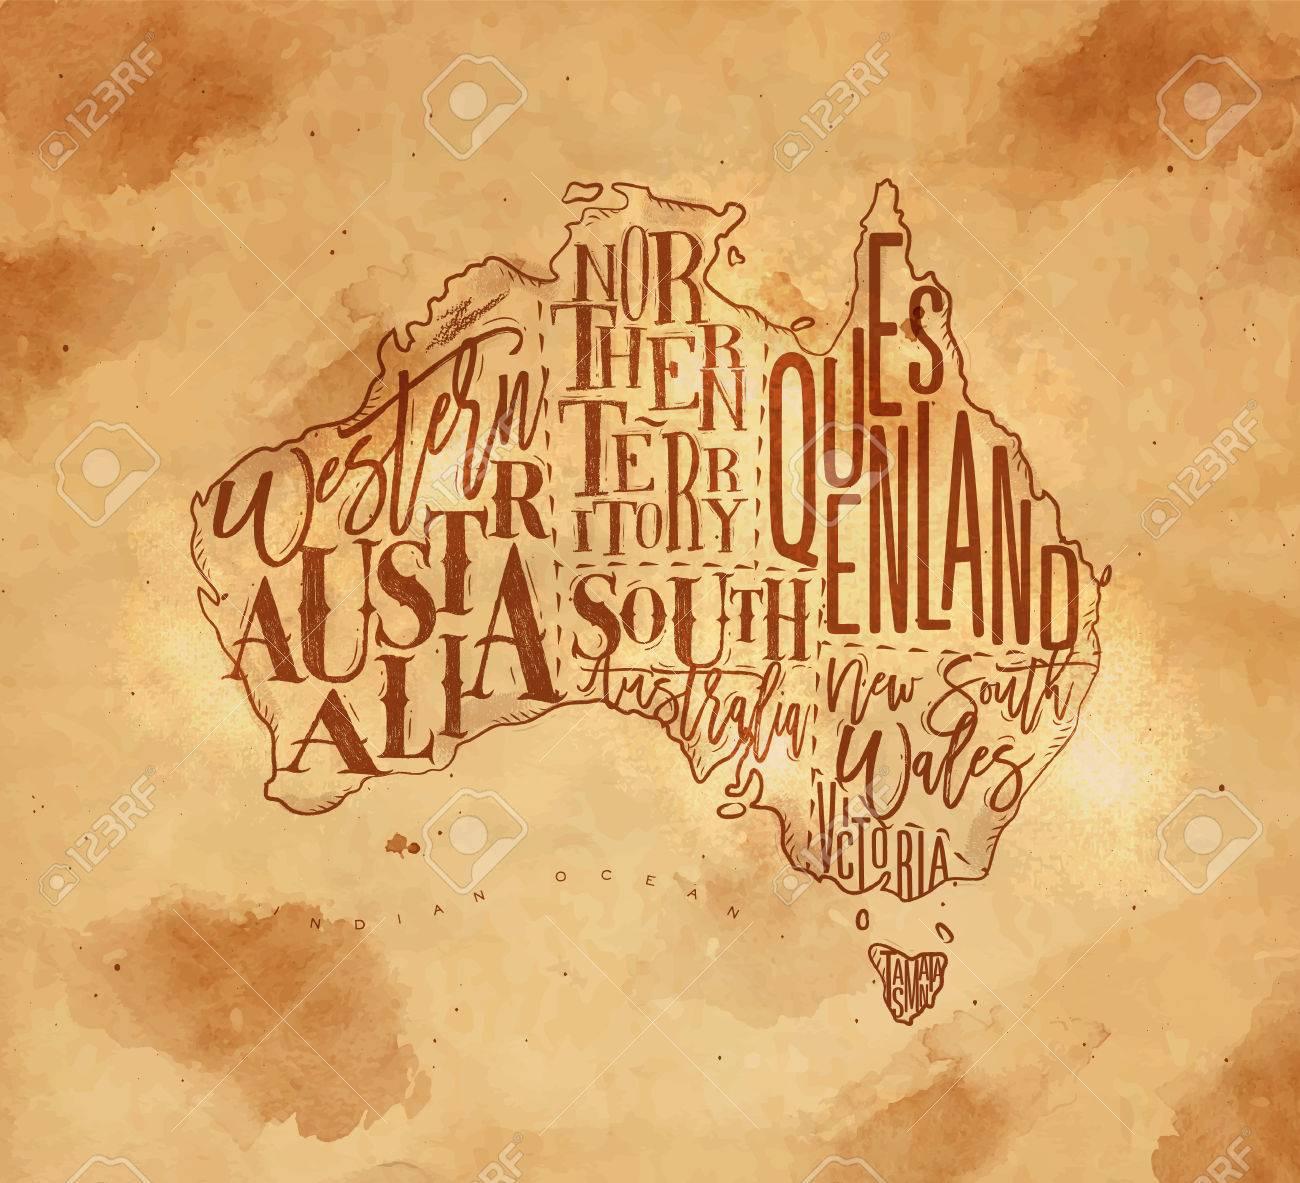 Map Of Northern Victoria Australia.Vintage Australia Map With Regions Inscriptionwestern Northern